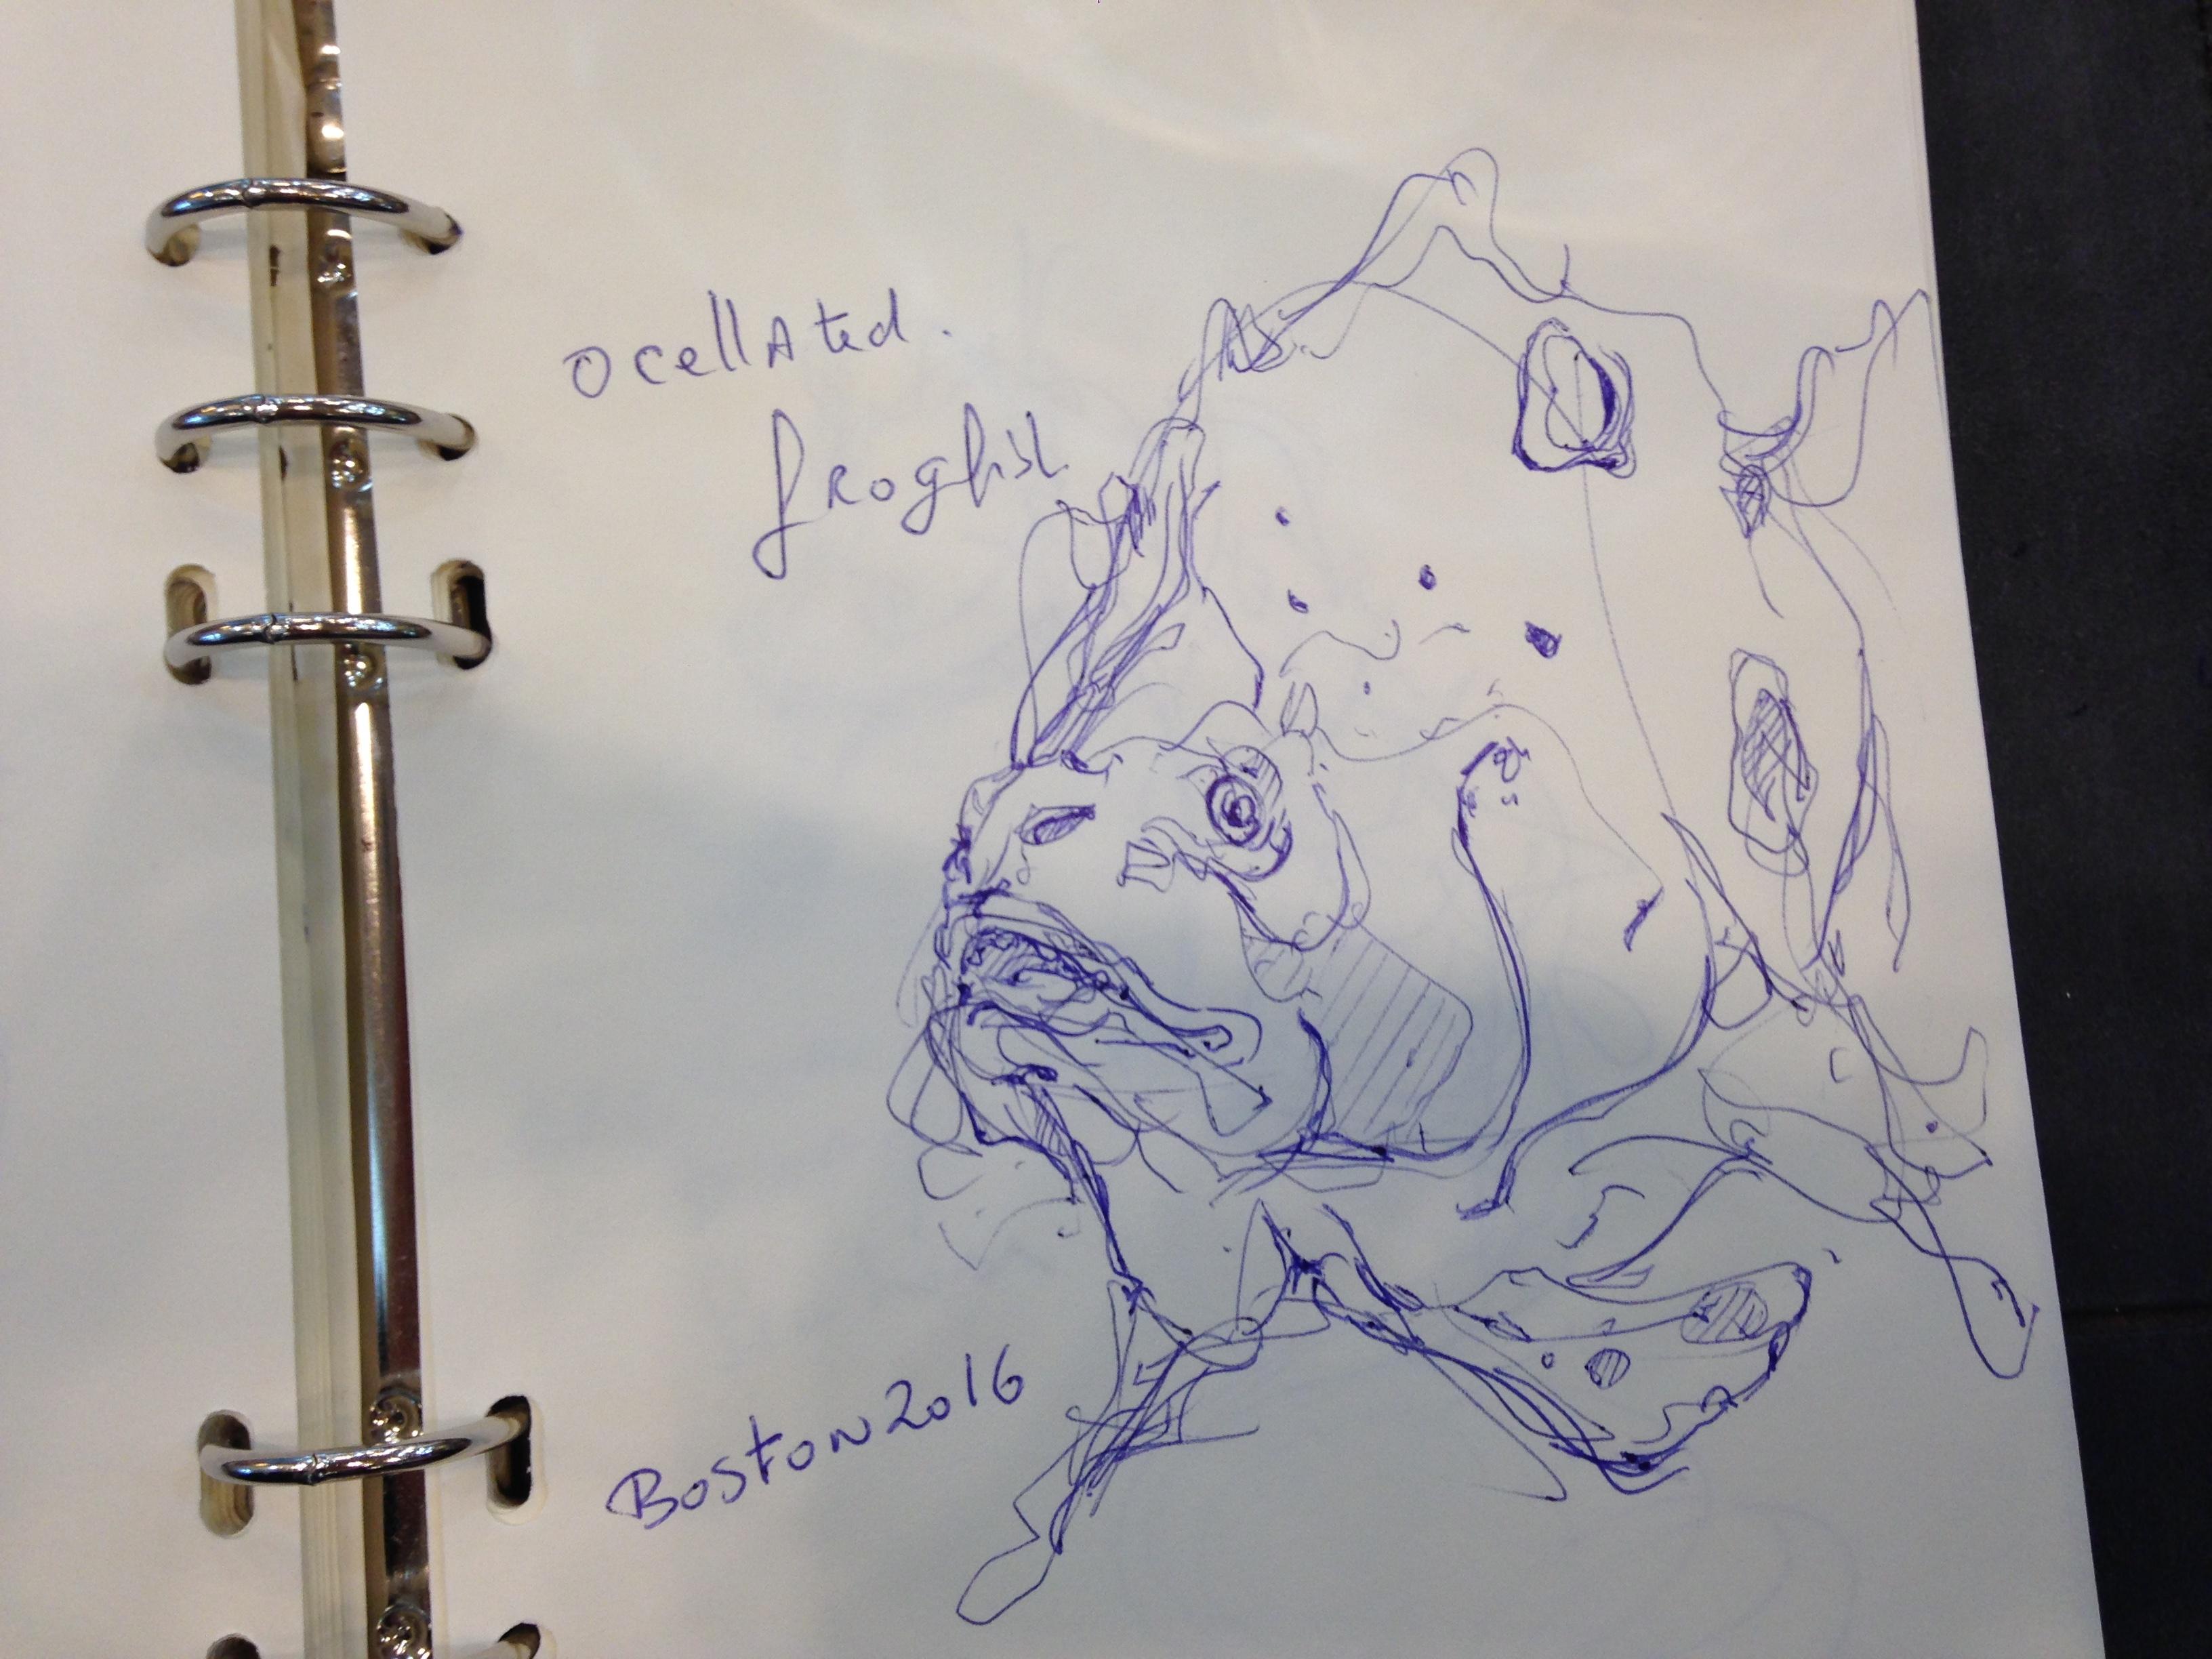 the design sketchbook sketch boston acquarium fish drawing ball point pen blue bic c